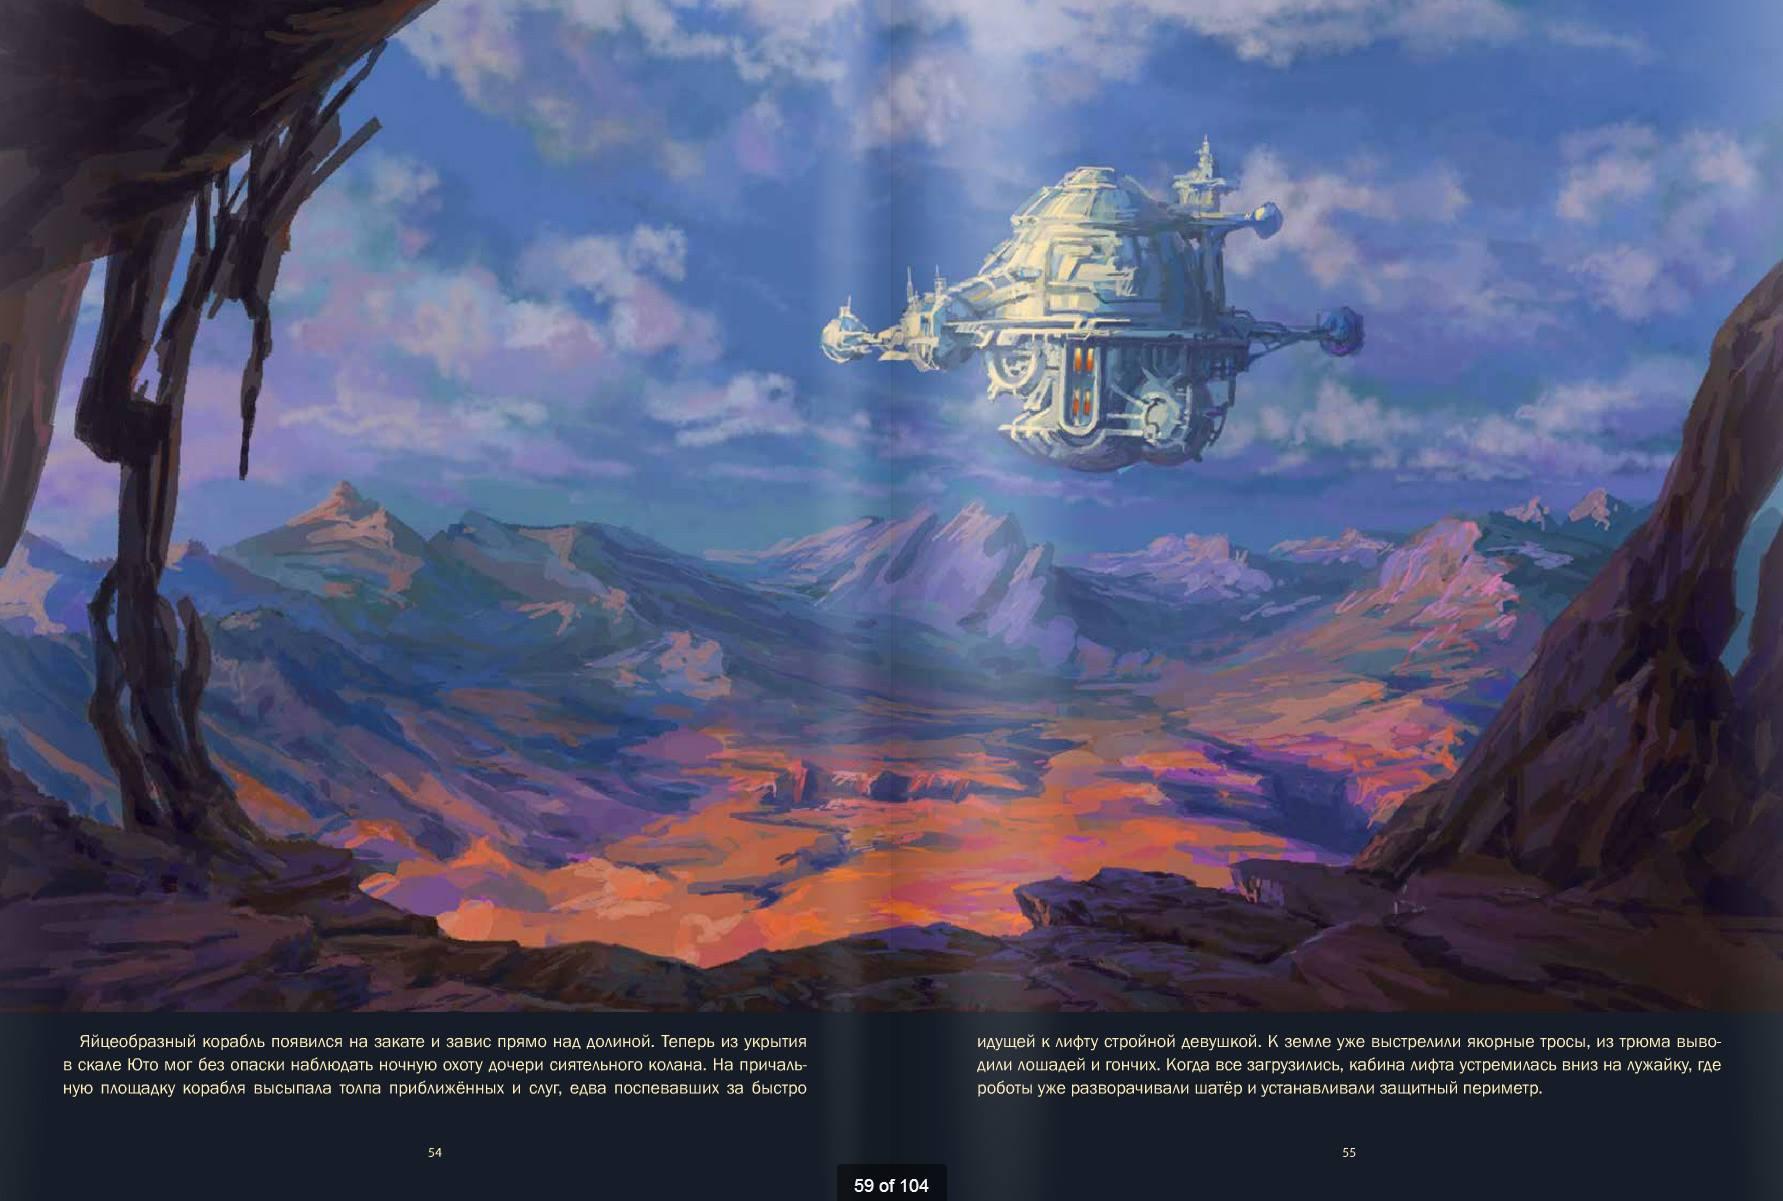 Sci-fi art book. Igor Savin